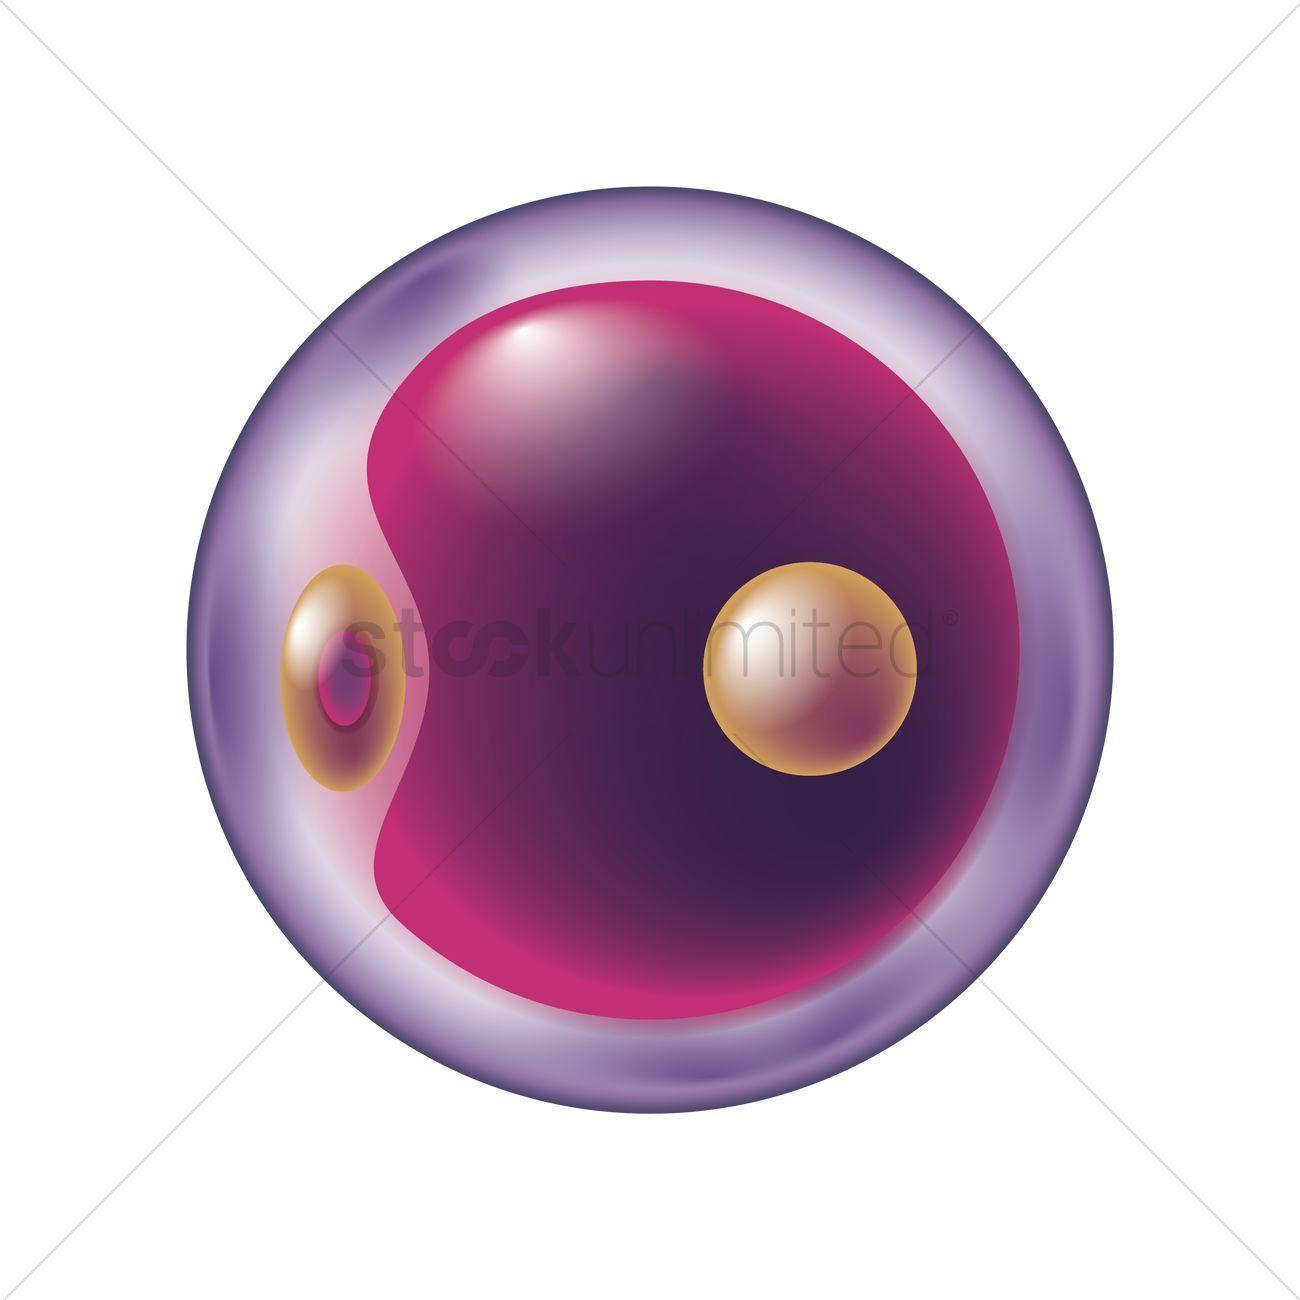 Stem cell clipart 6 » Clipart Portal.